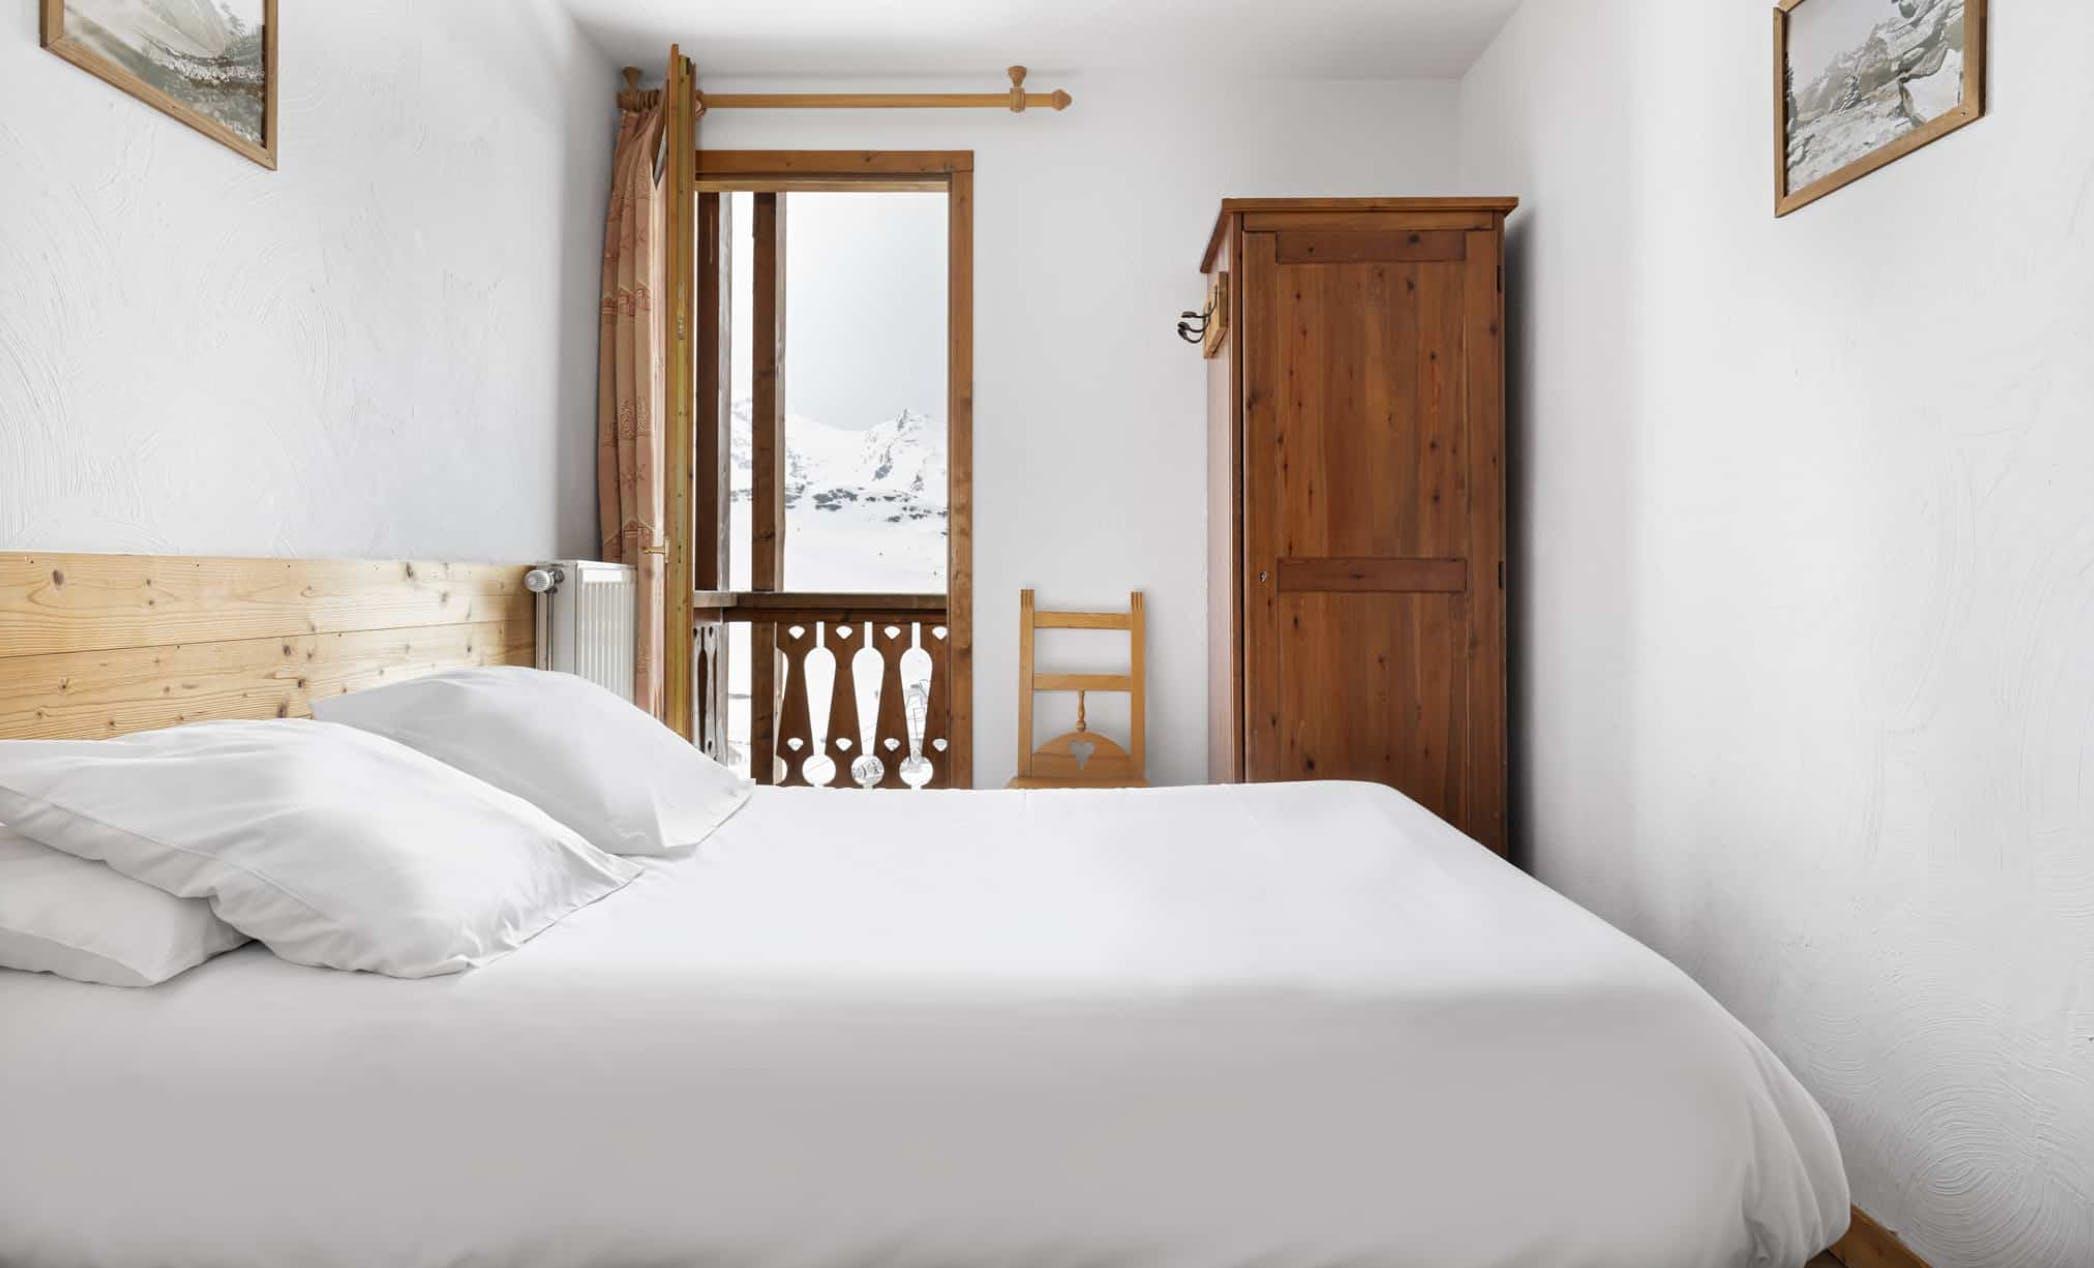 Résidence Val Chavière bedroom